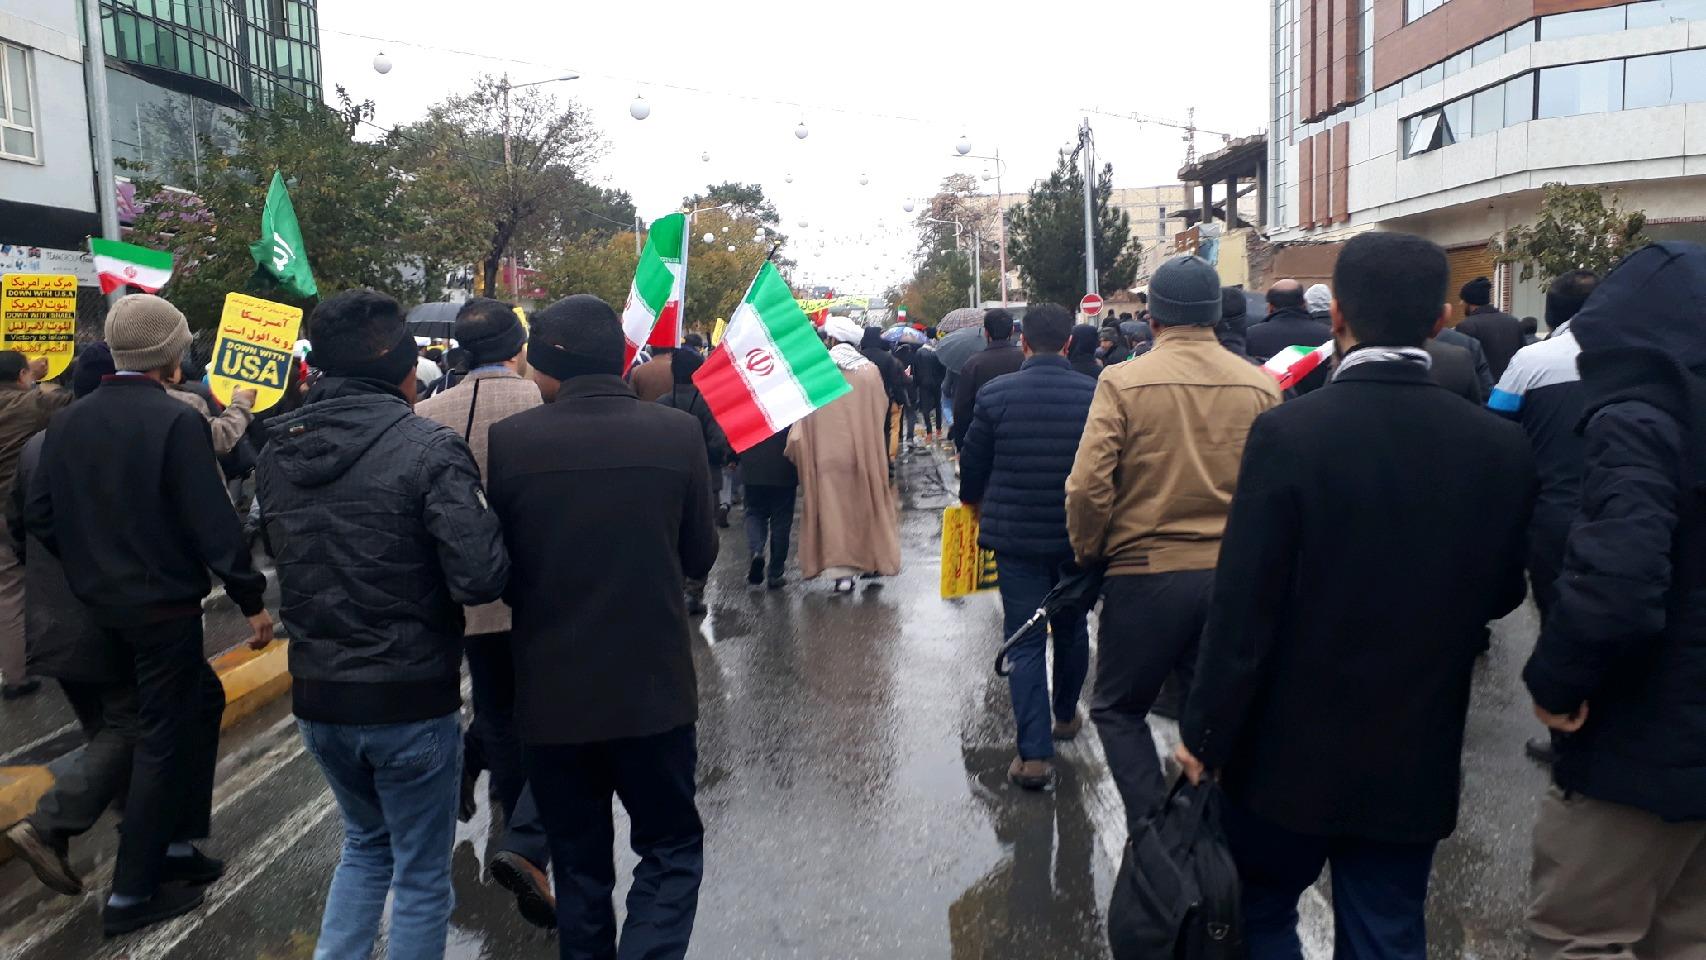 خروش دیار کریمان برضد دشمنان اتحاد وهمدلی+تصویر